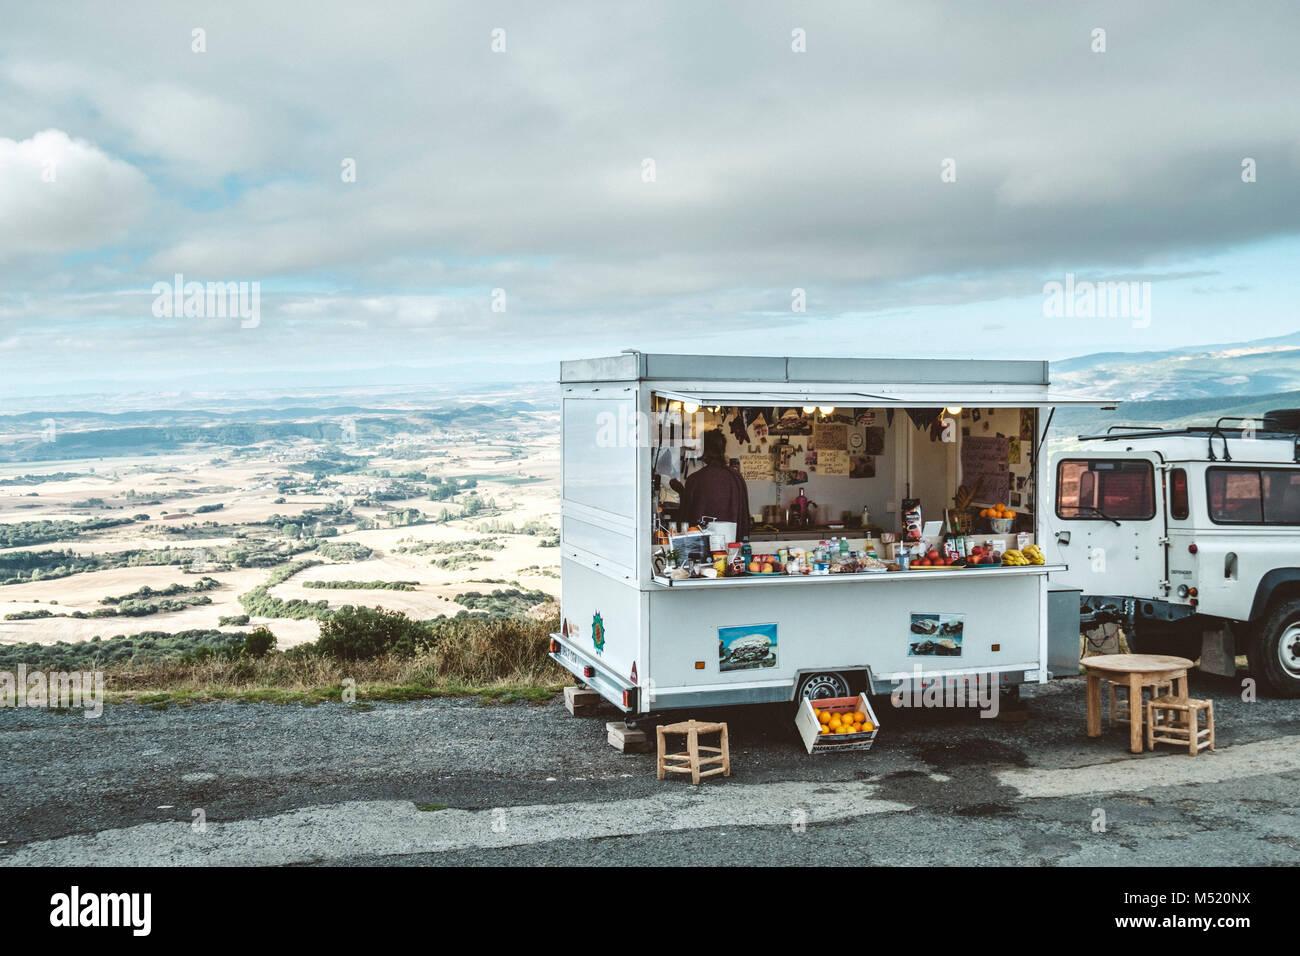 Food truck parked on roadside, Pamplona, Navarre, Spain - Stock Image